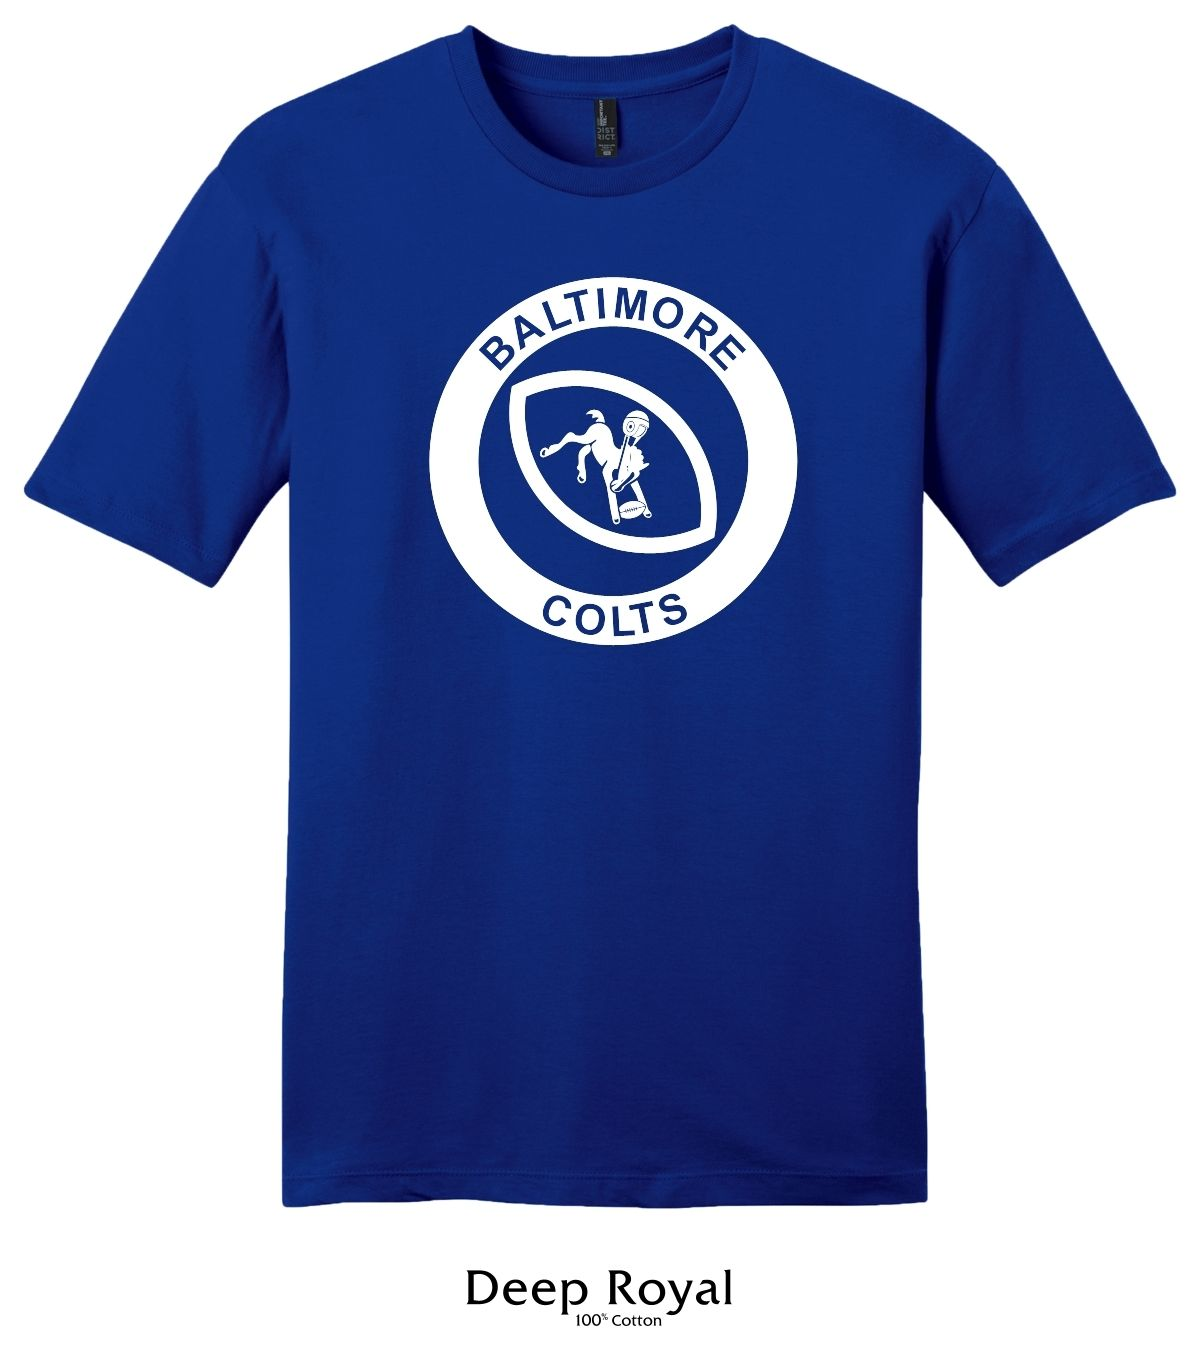 Baltimore Colts Vintage 1953 Logo T Shirt